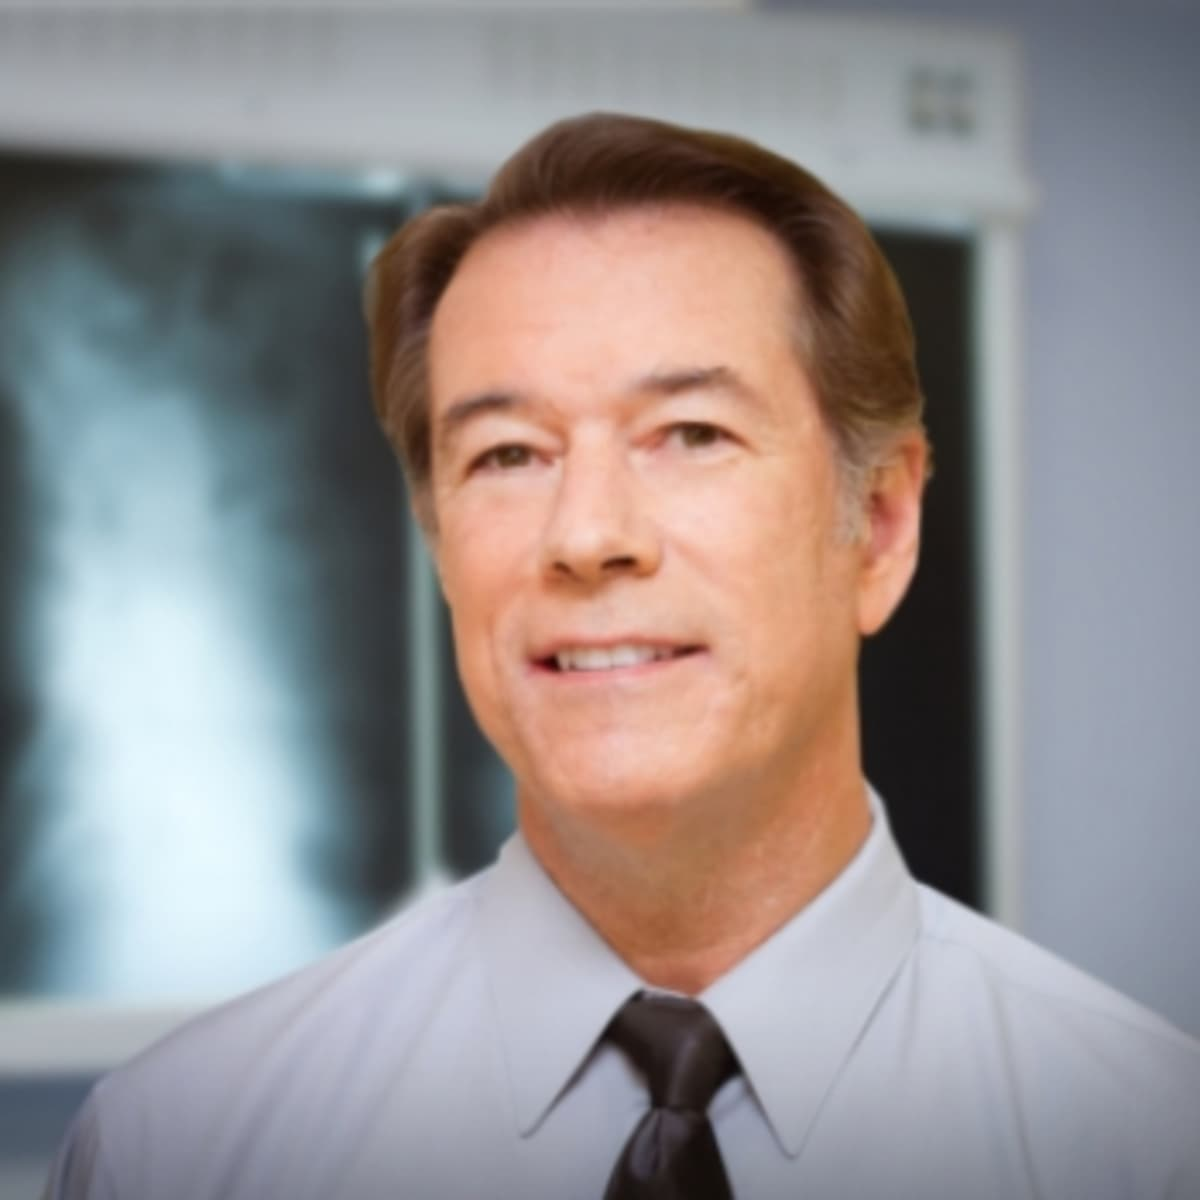 Dr G Baynham Md Palm Beach Gardens Fl Orthopedic